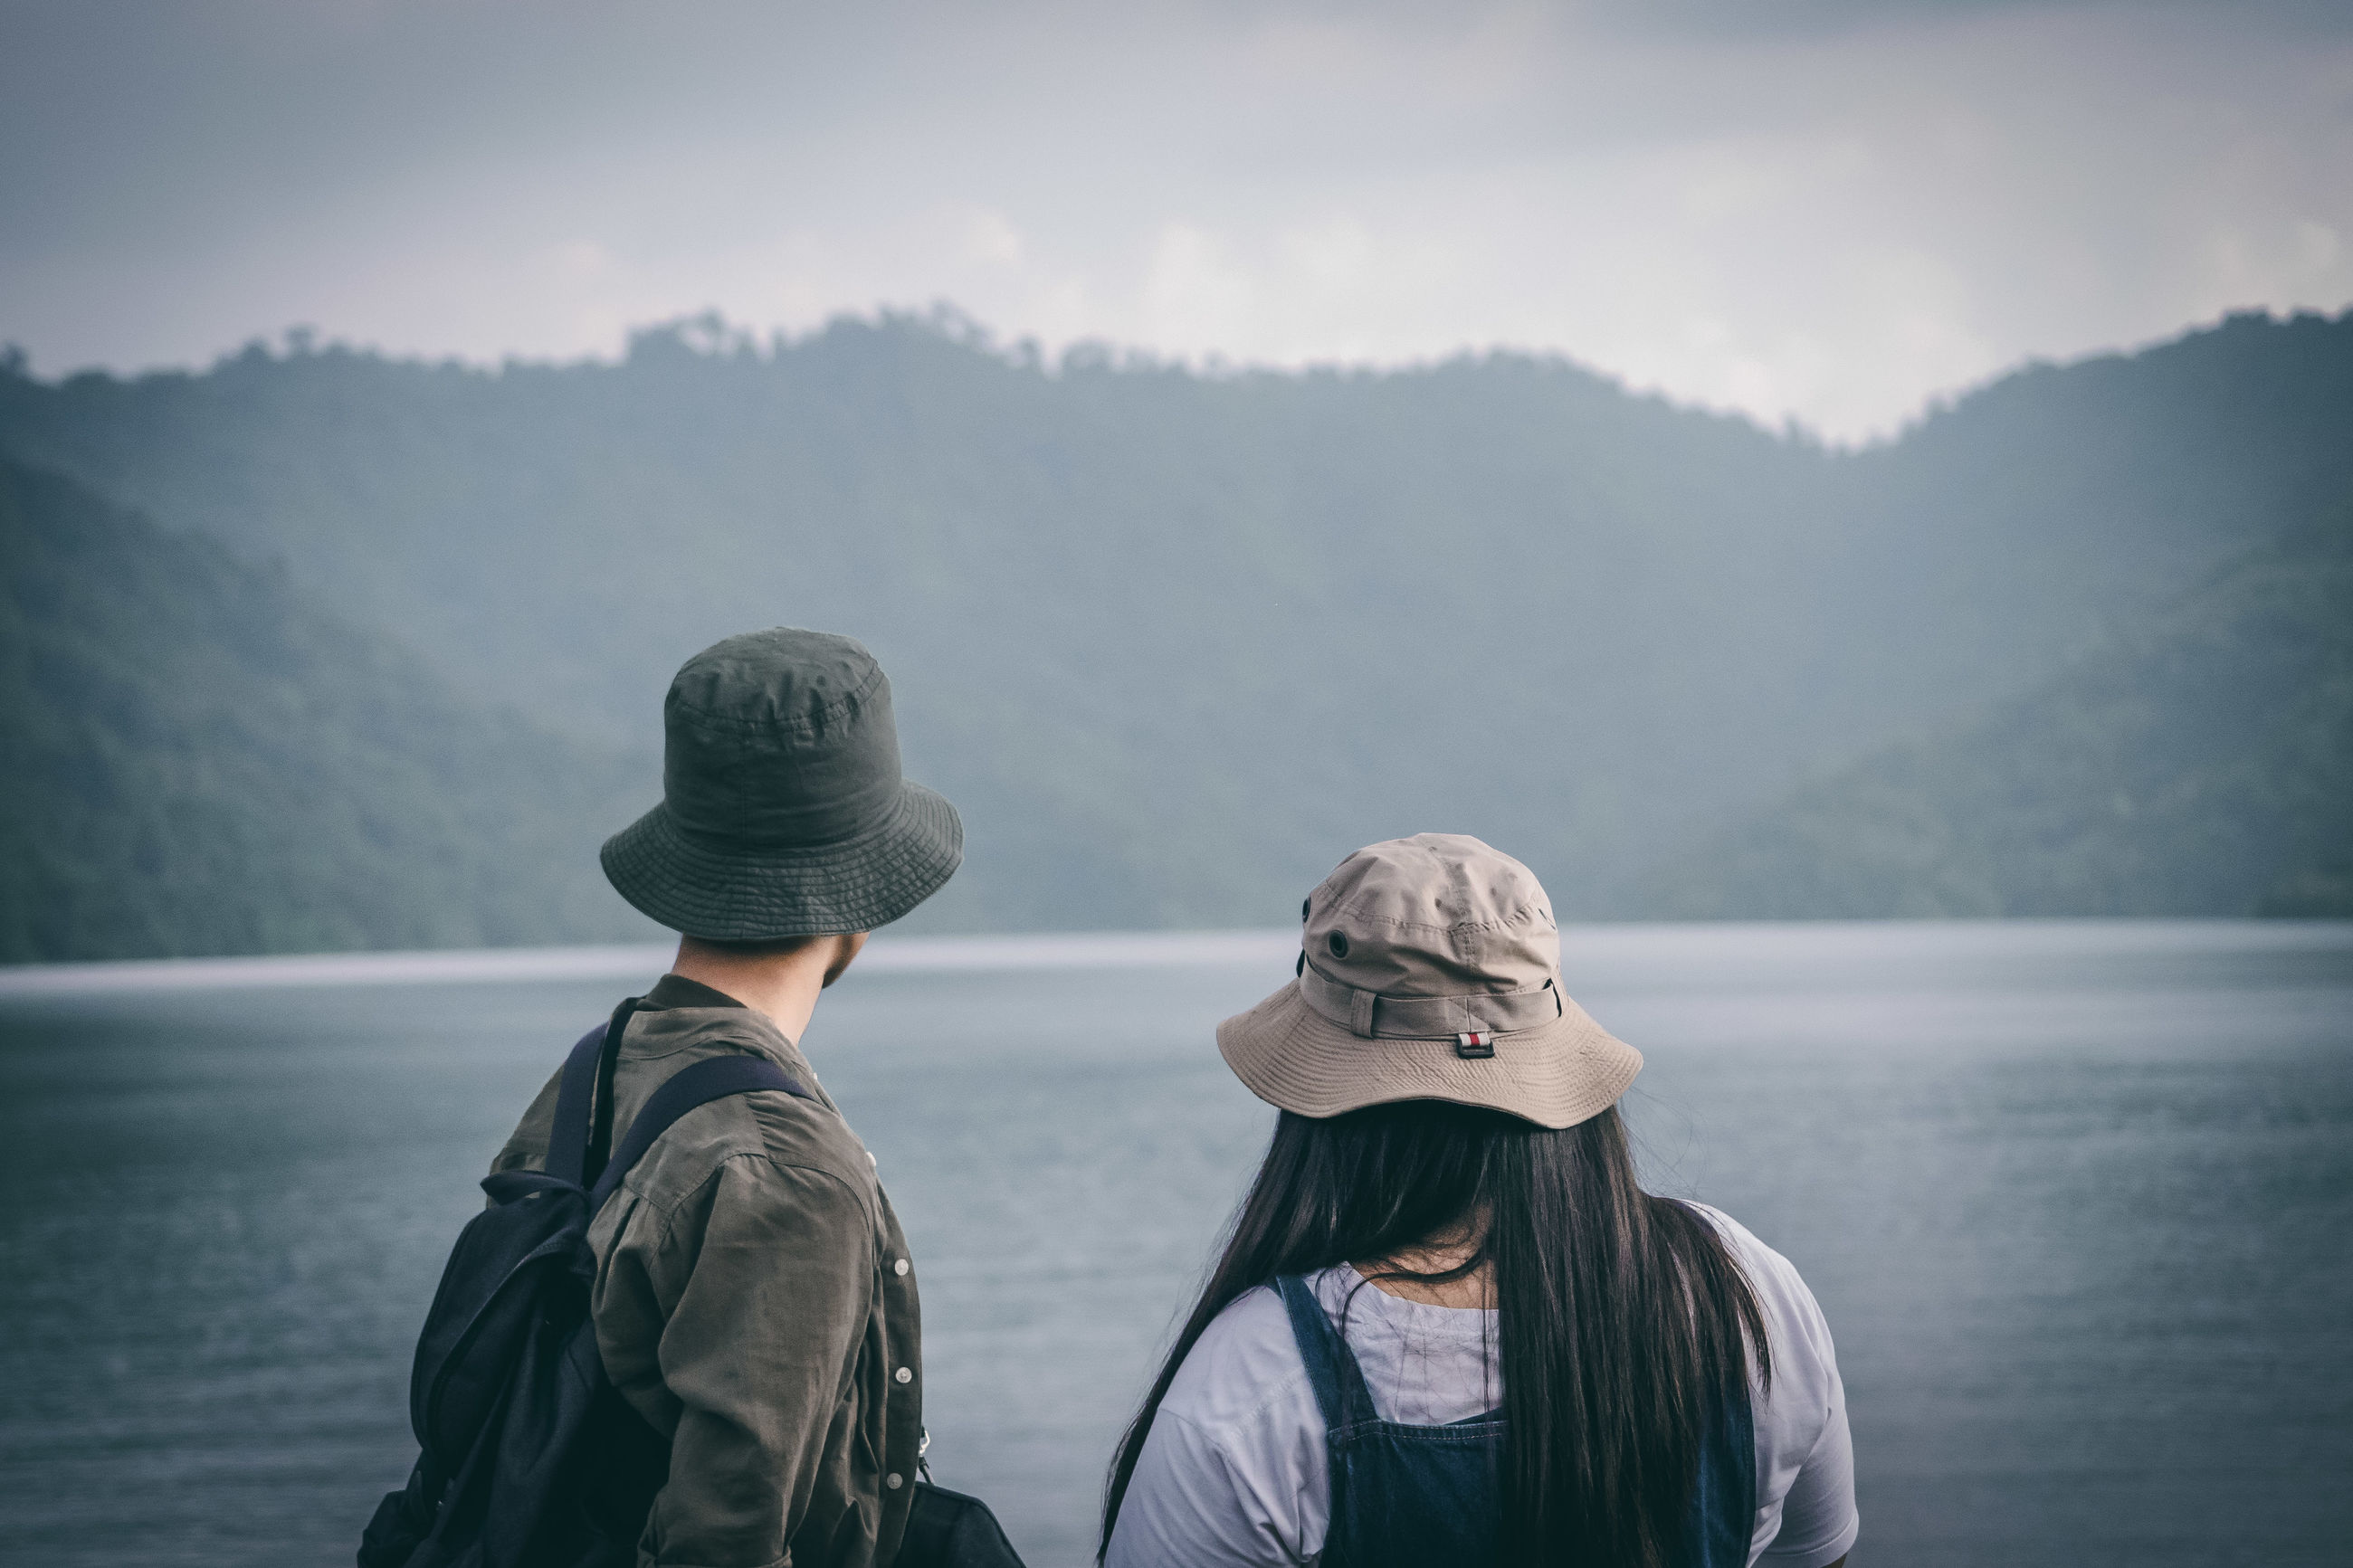 REAR VIEW OF WOMEN LOOKING AT LAKE AGAINST MOUNTAIN RANGE